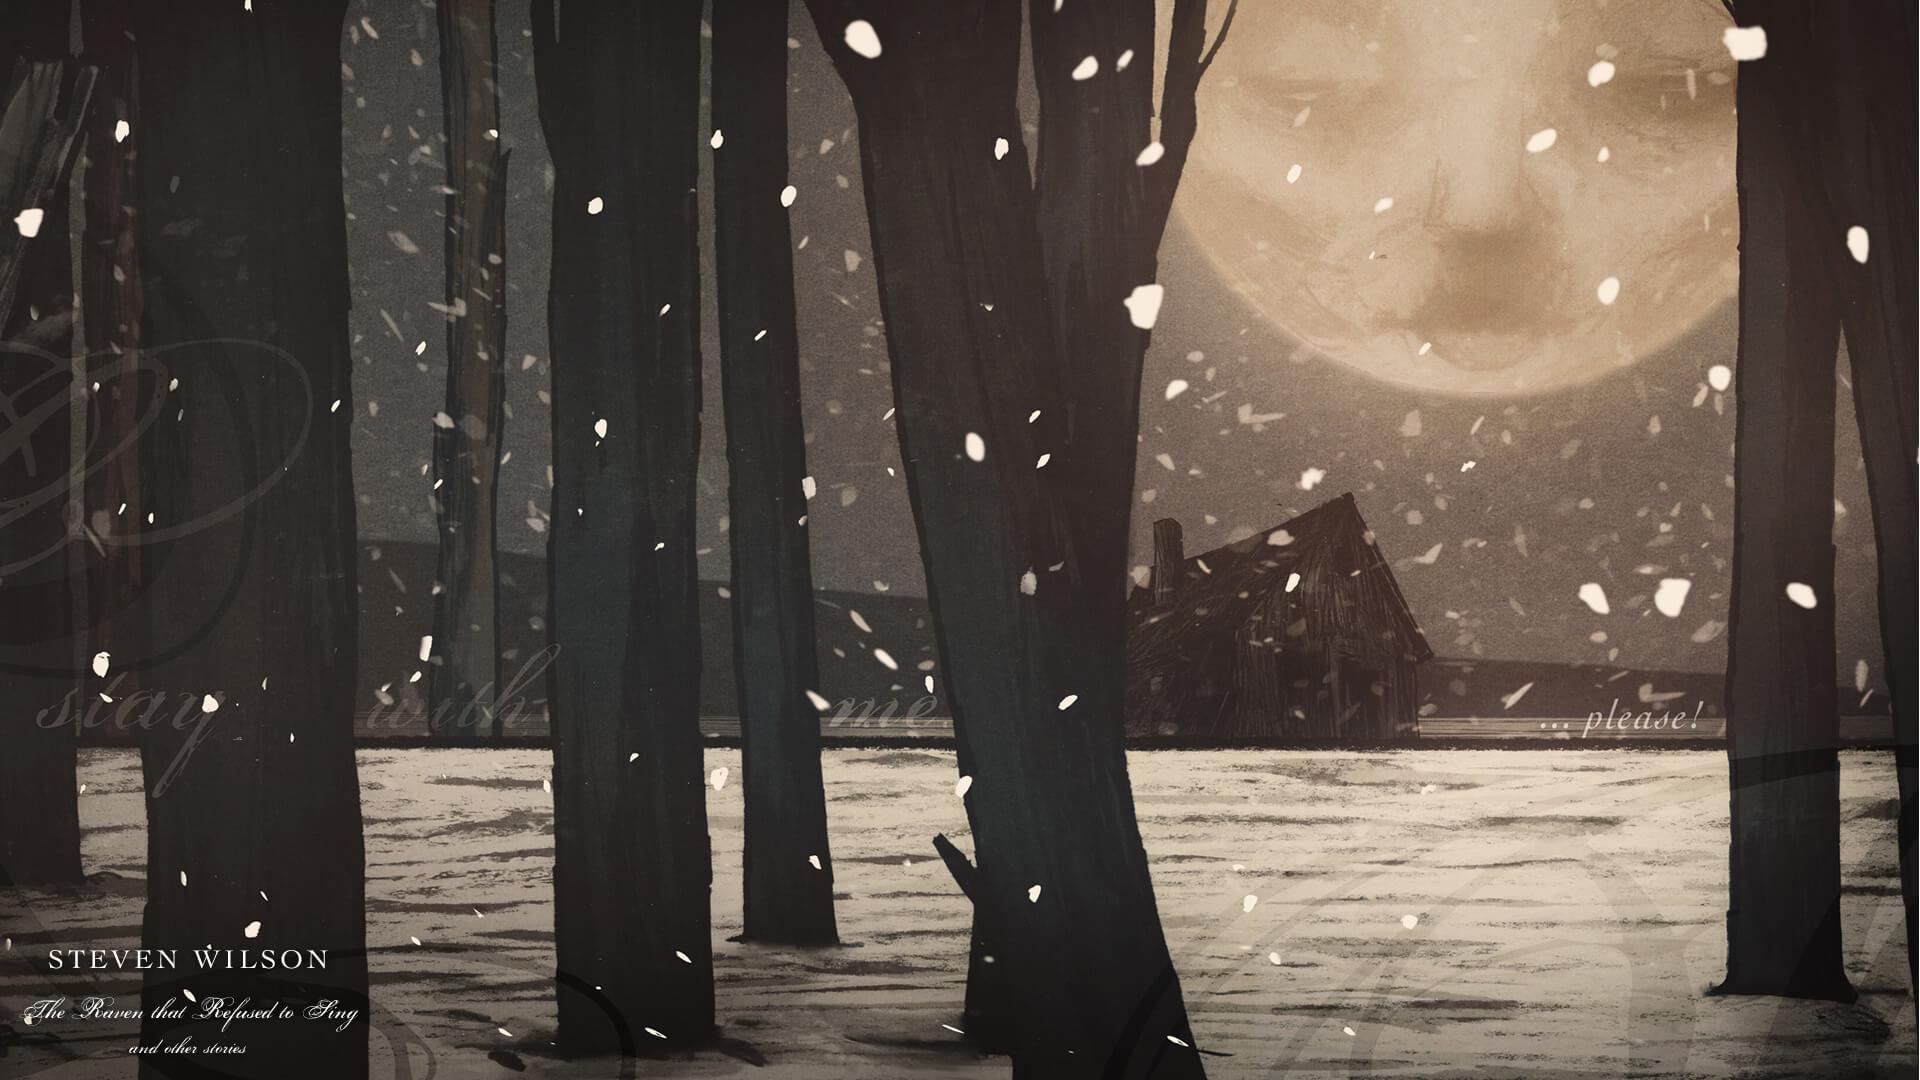 hajo background 6 1080   Steven Wilson 1920x1080